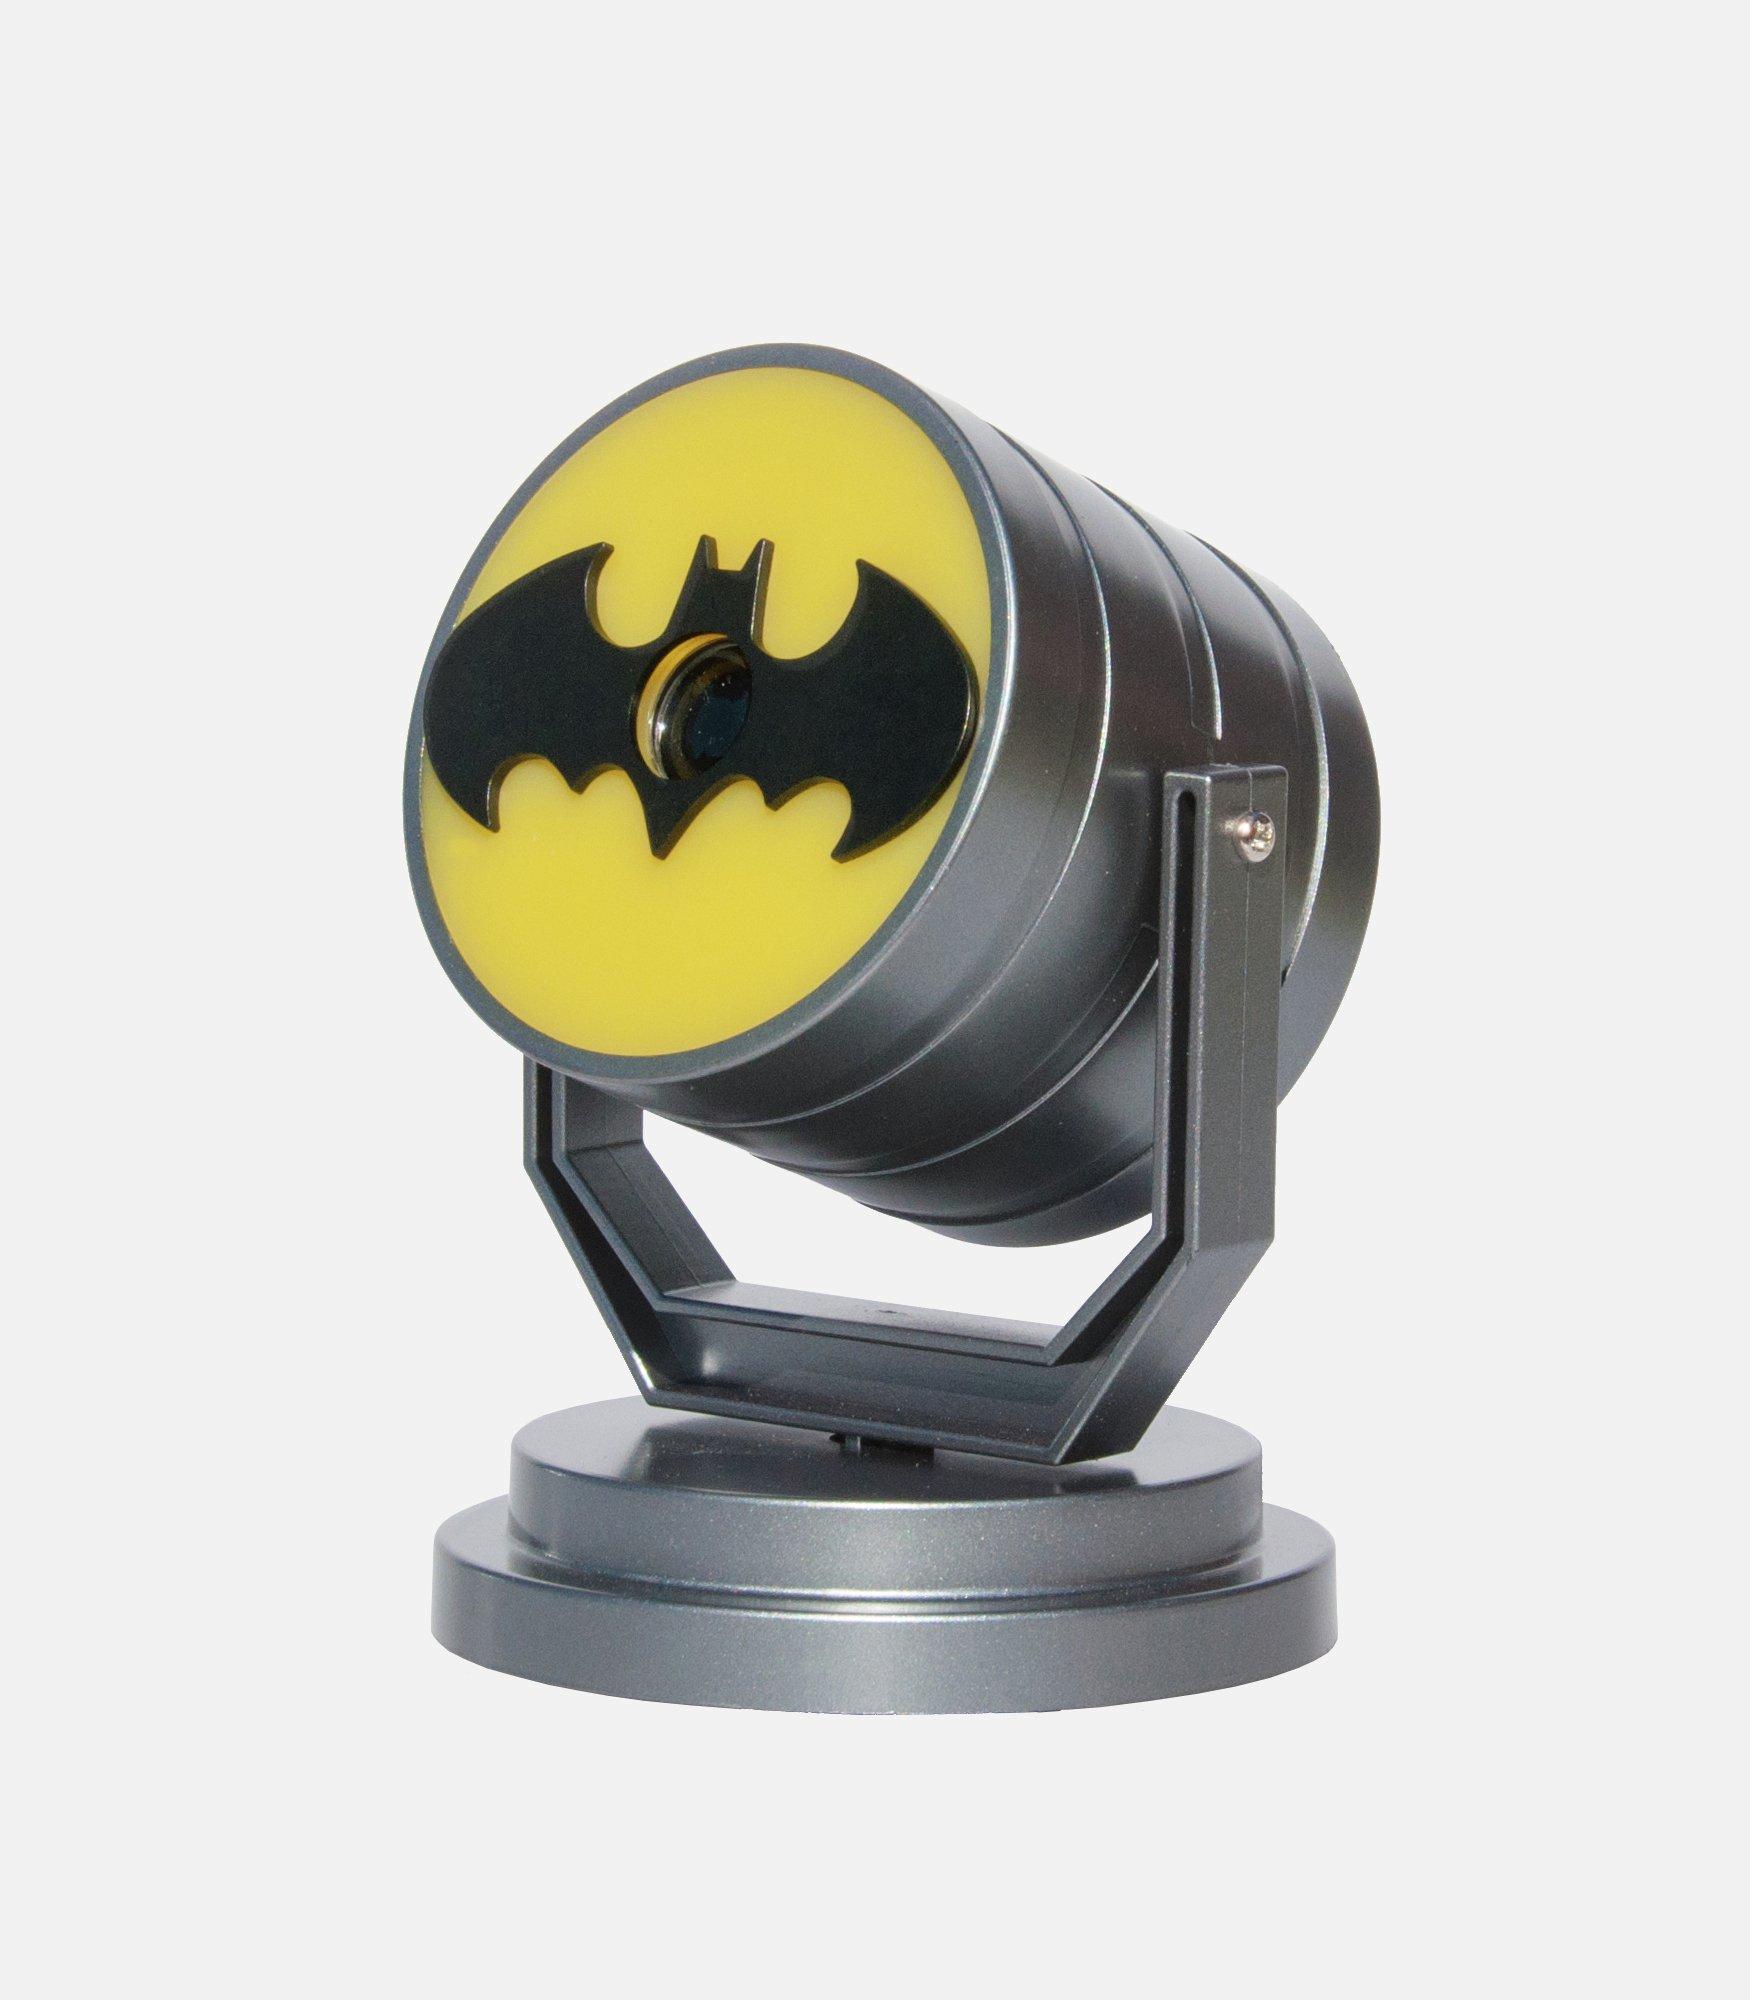 Image of Batman Projector Light